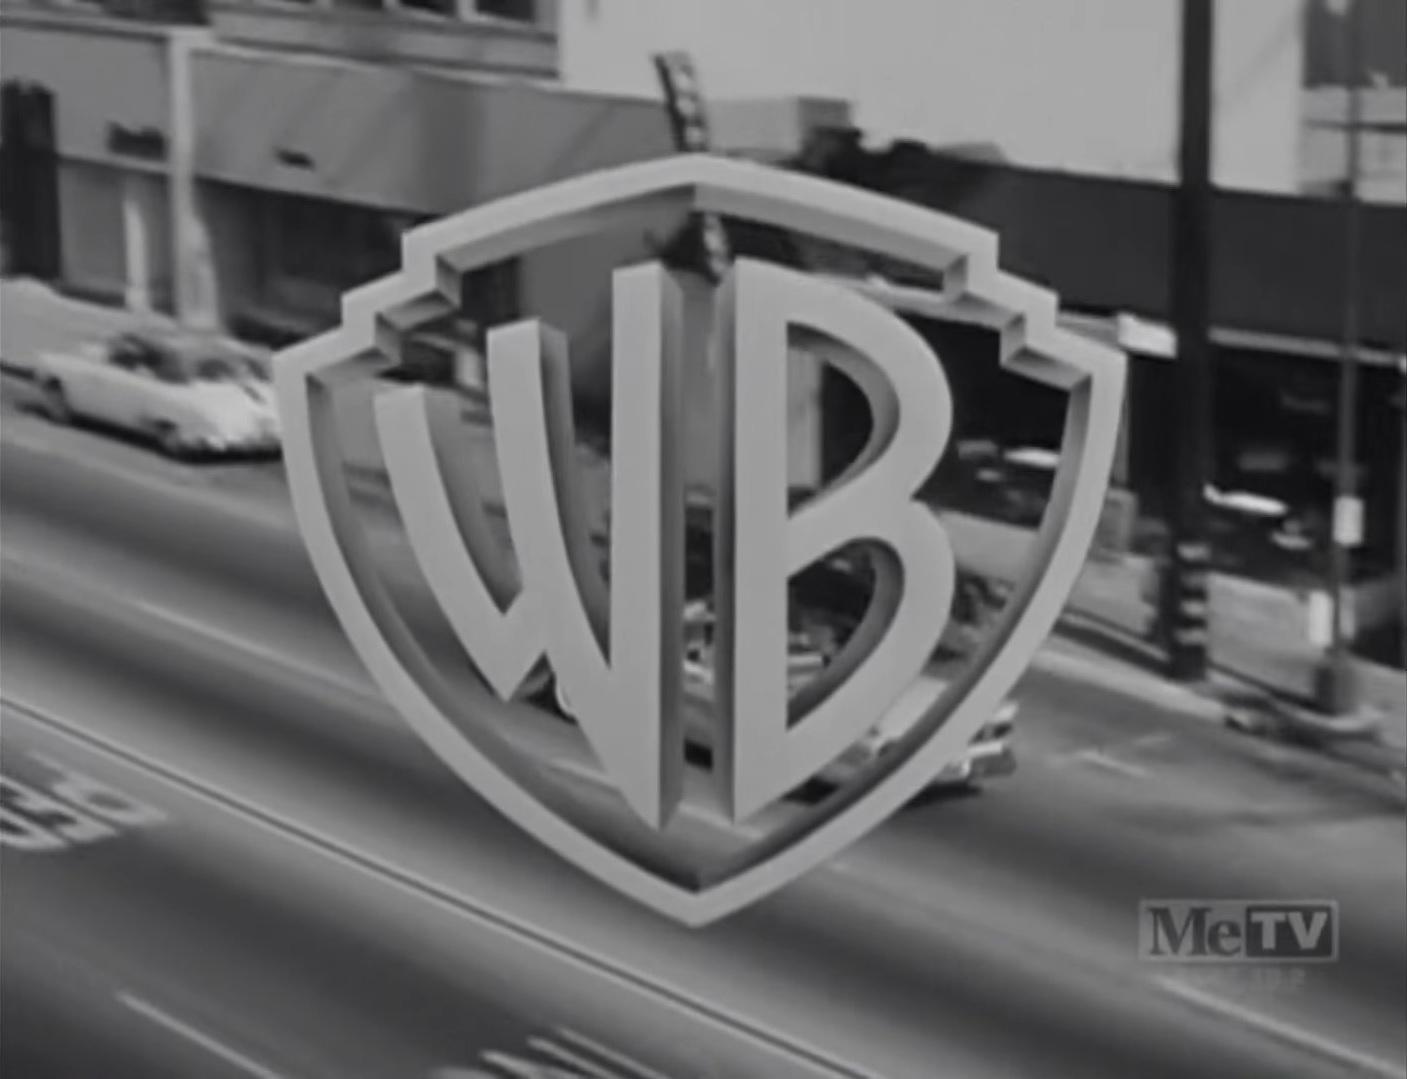 Warner Bros. Television/Other